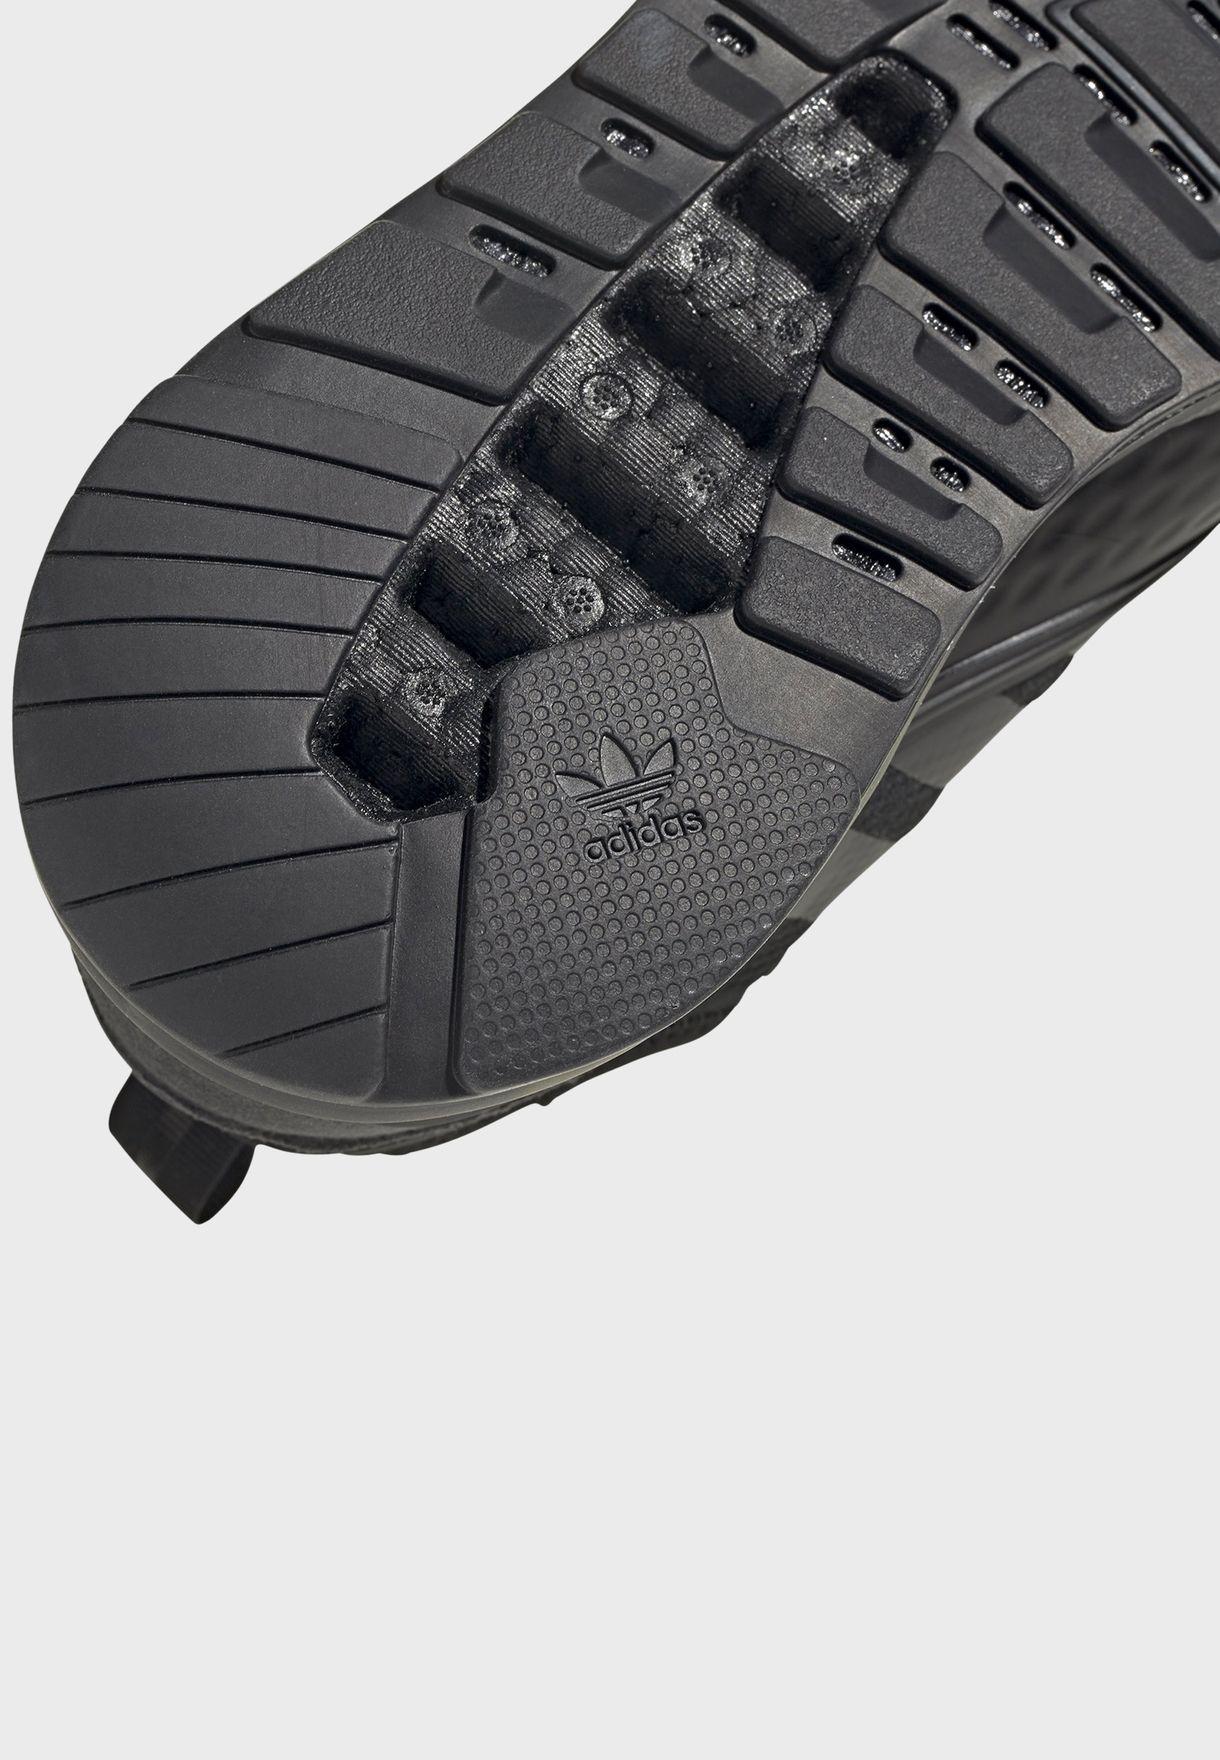 حذاء زد اكس فيوز بوست